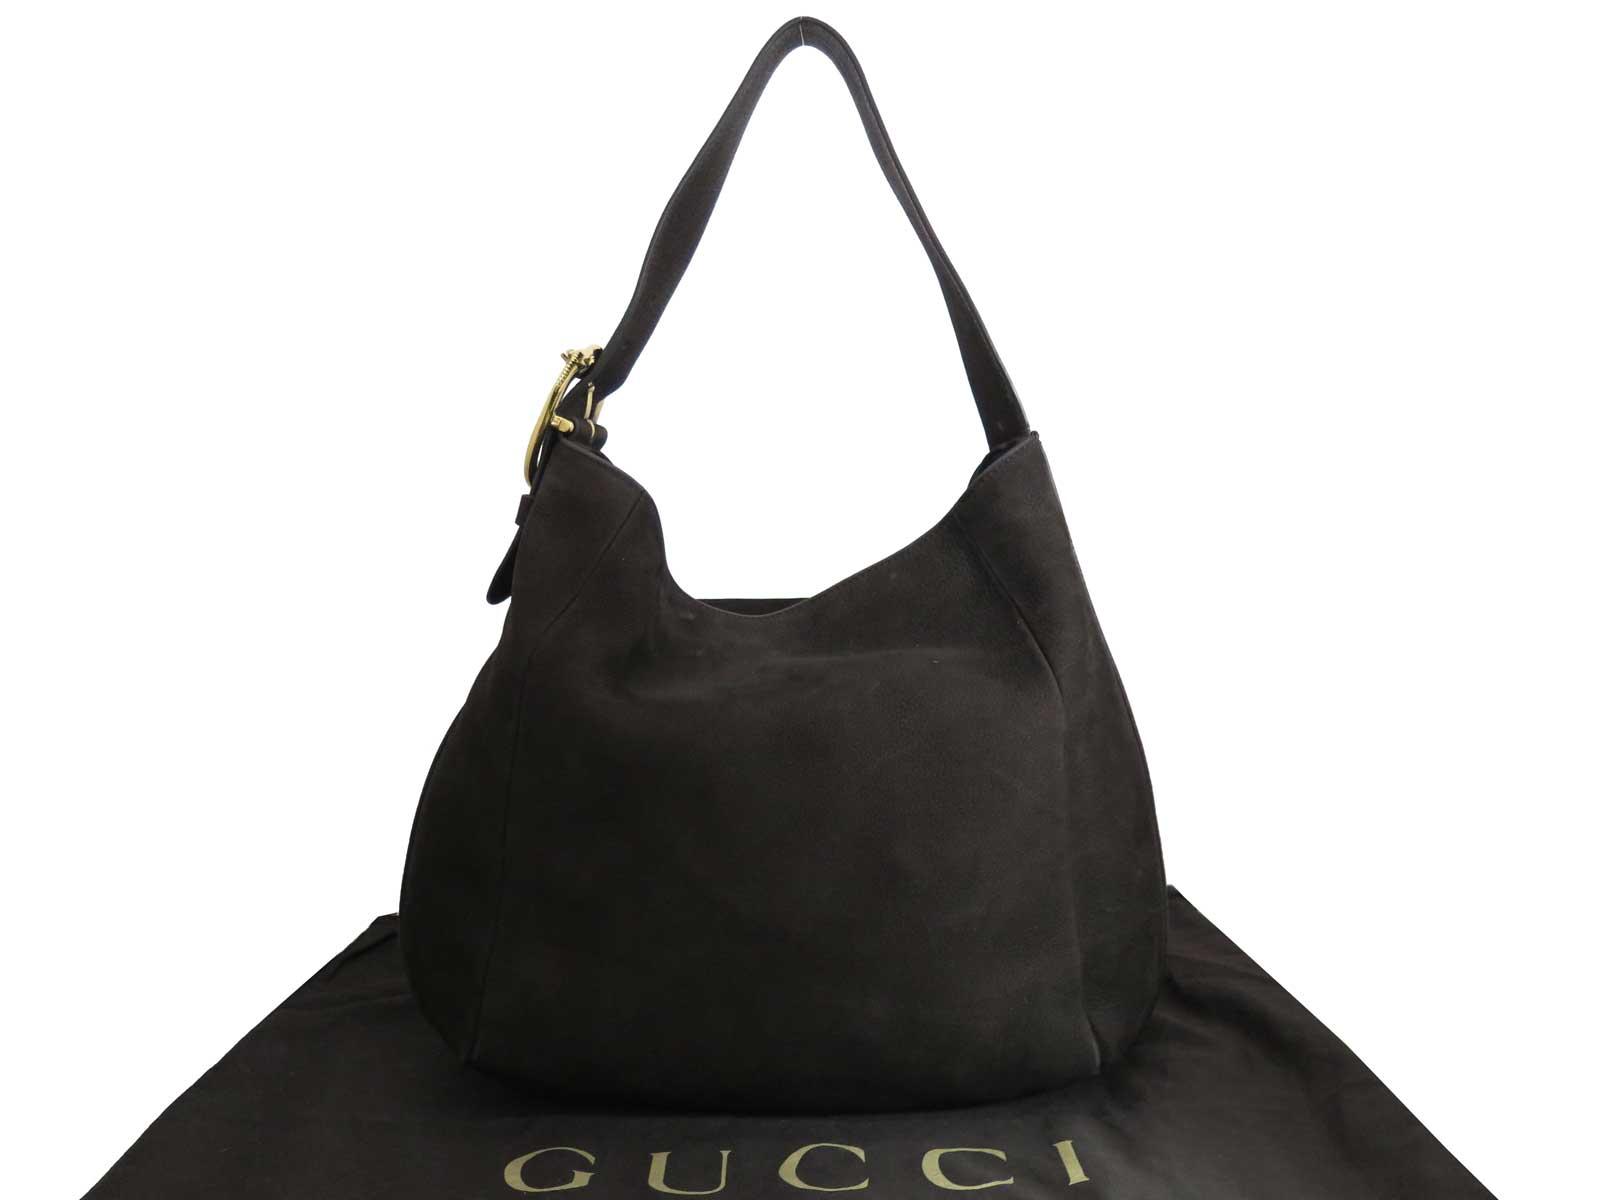 bb19b54cd6 Auth Gucci Horse Head Big Shoulder Bag Dark Brown/Goldtone Suede - e39600.  Item Photos